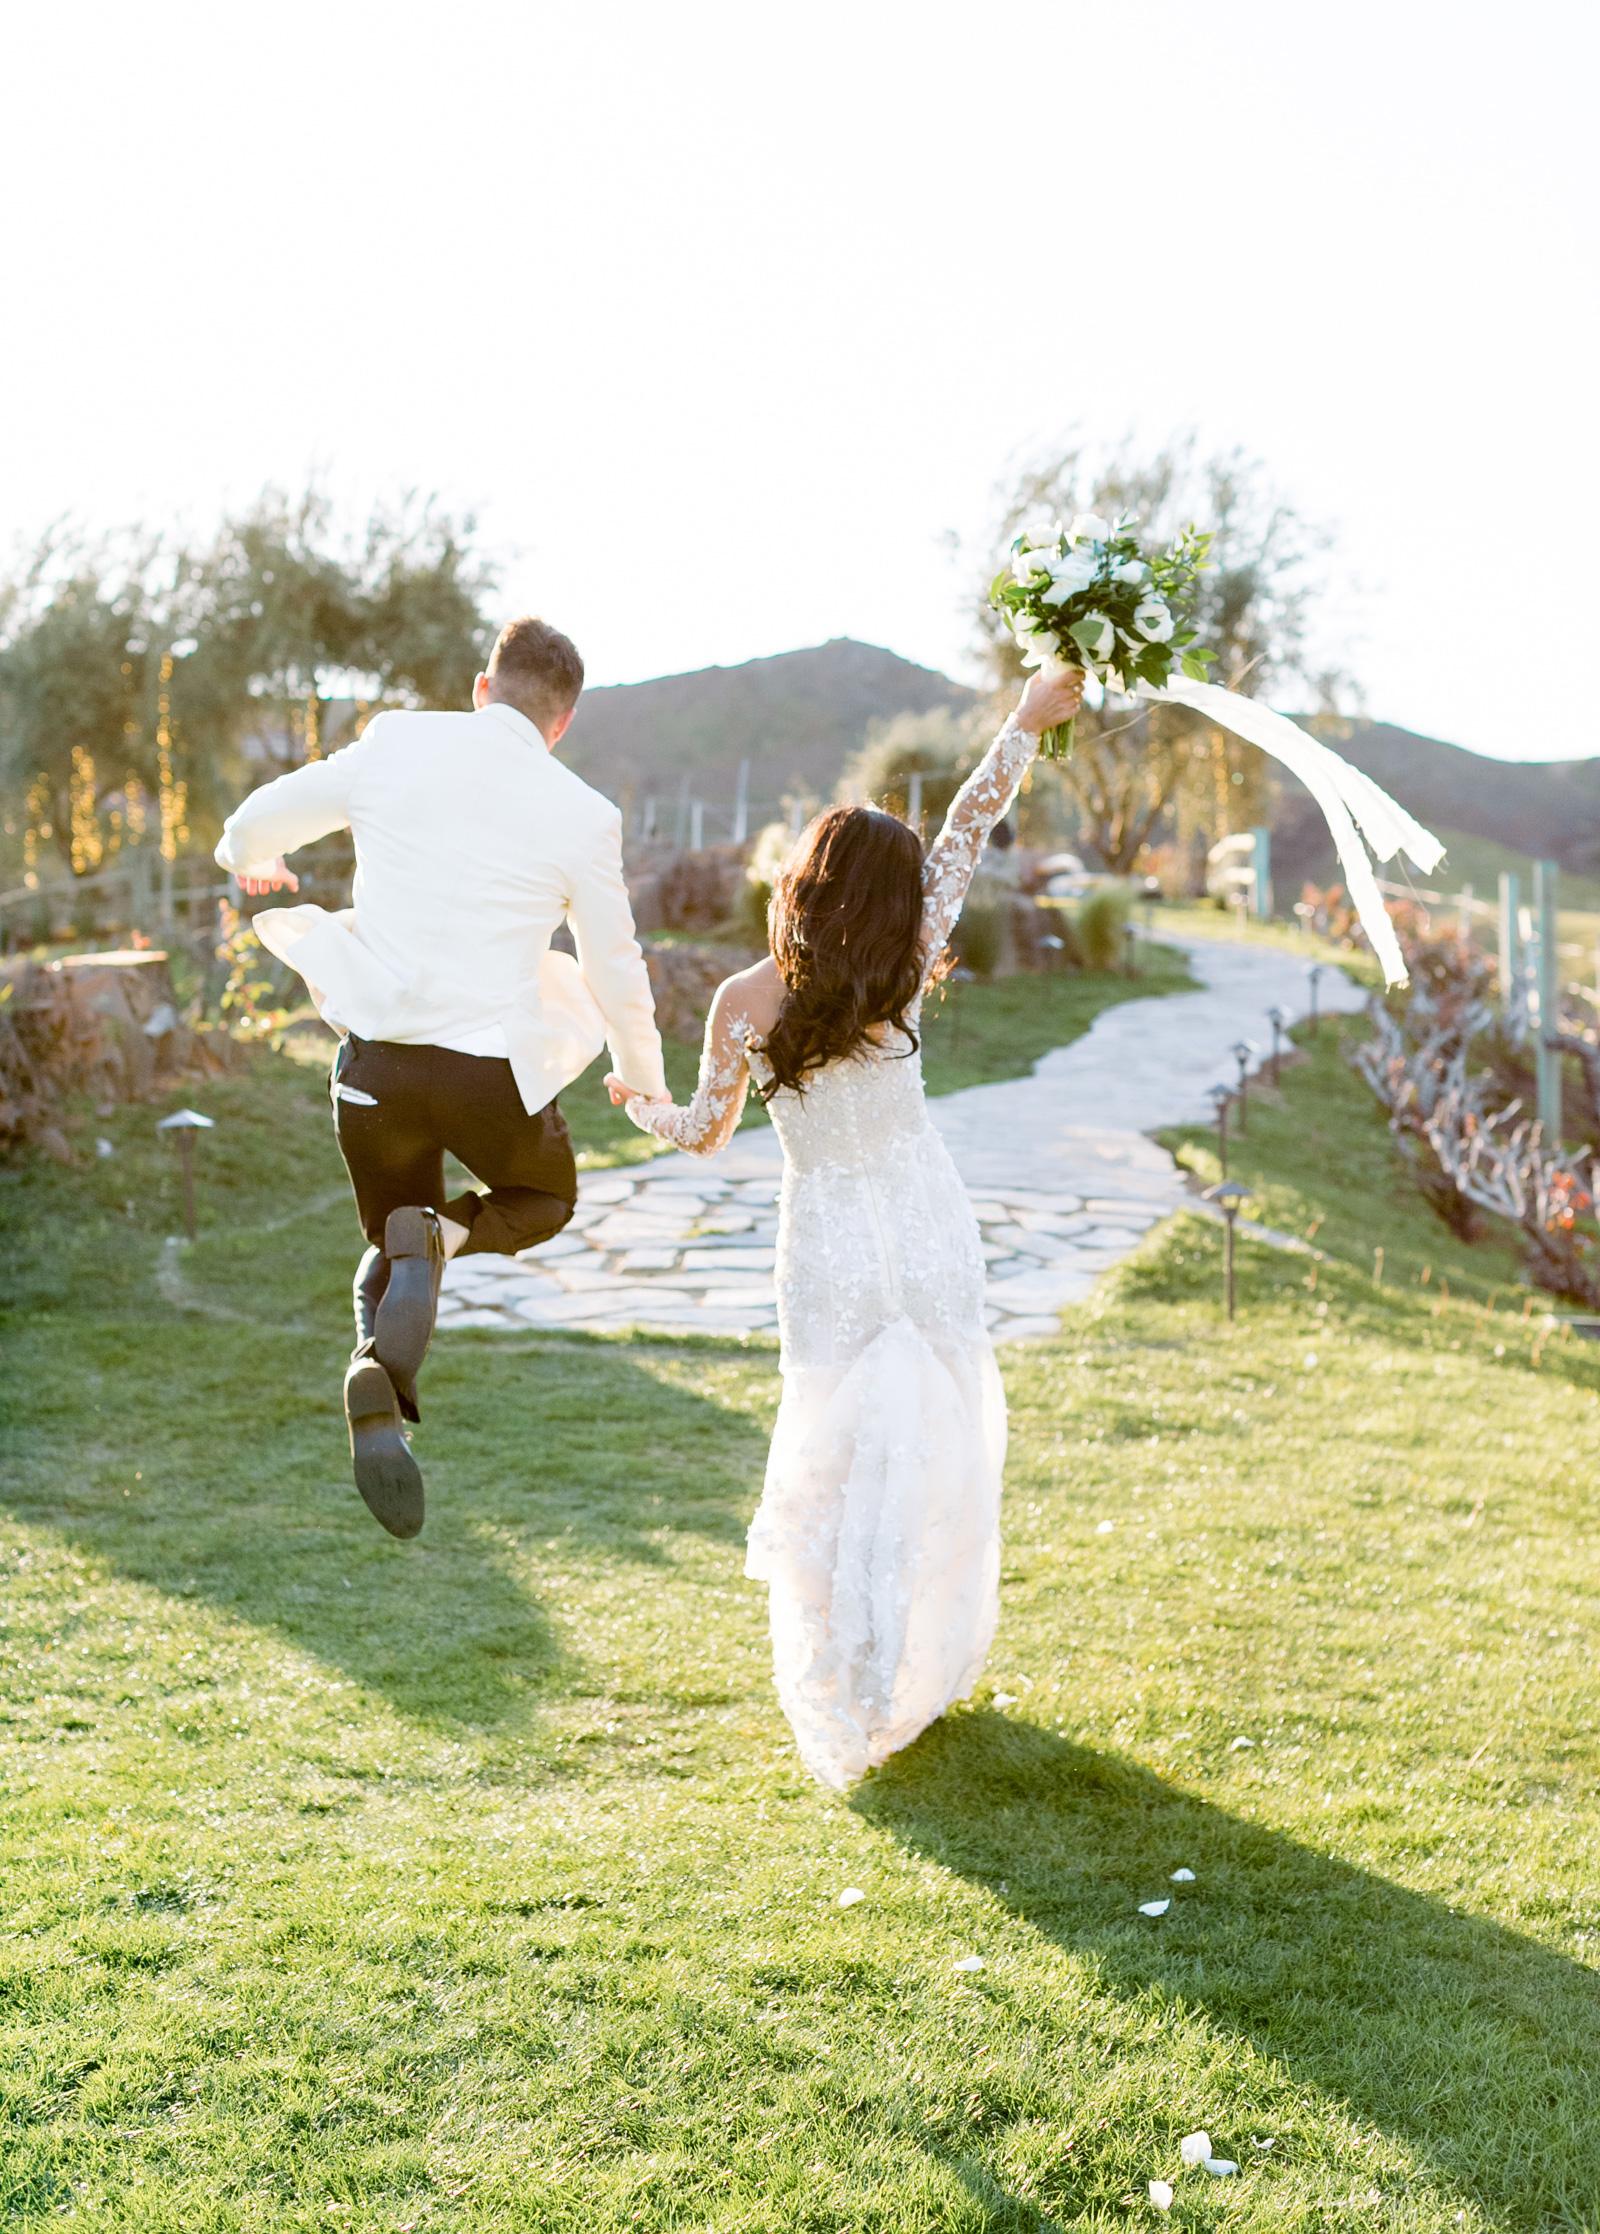 Style-Me-Pretty-Malibu-Wedding-Venues-Southern-California-Wedding-Photographer-Triunfo-Creek-Malibu-Photographer-Natalie-Schutt-Photography_01.jpg